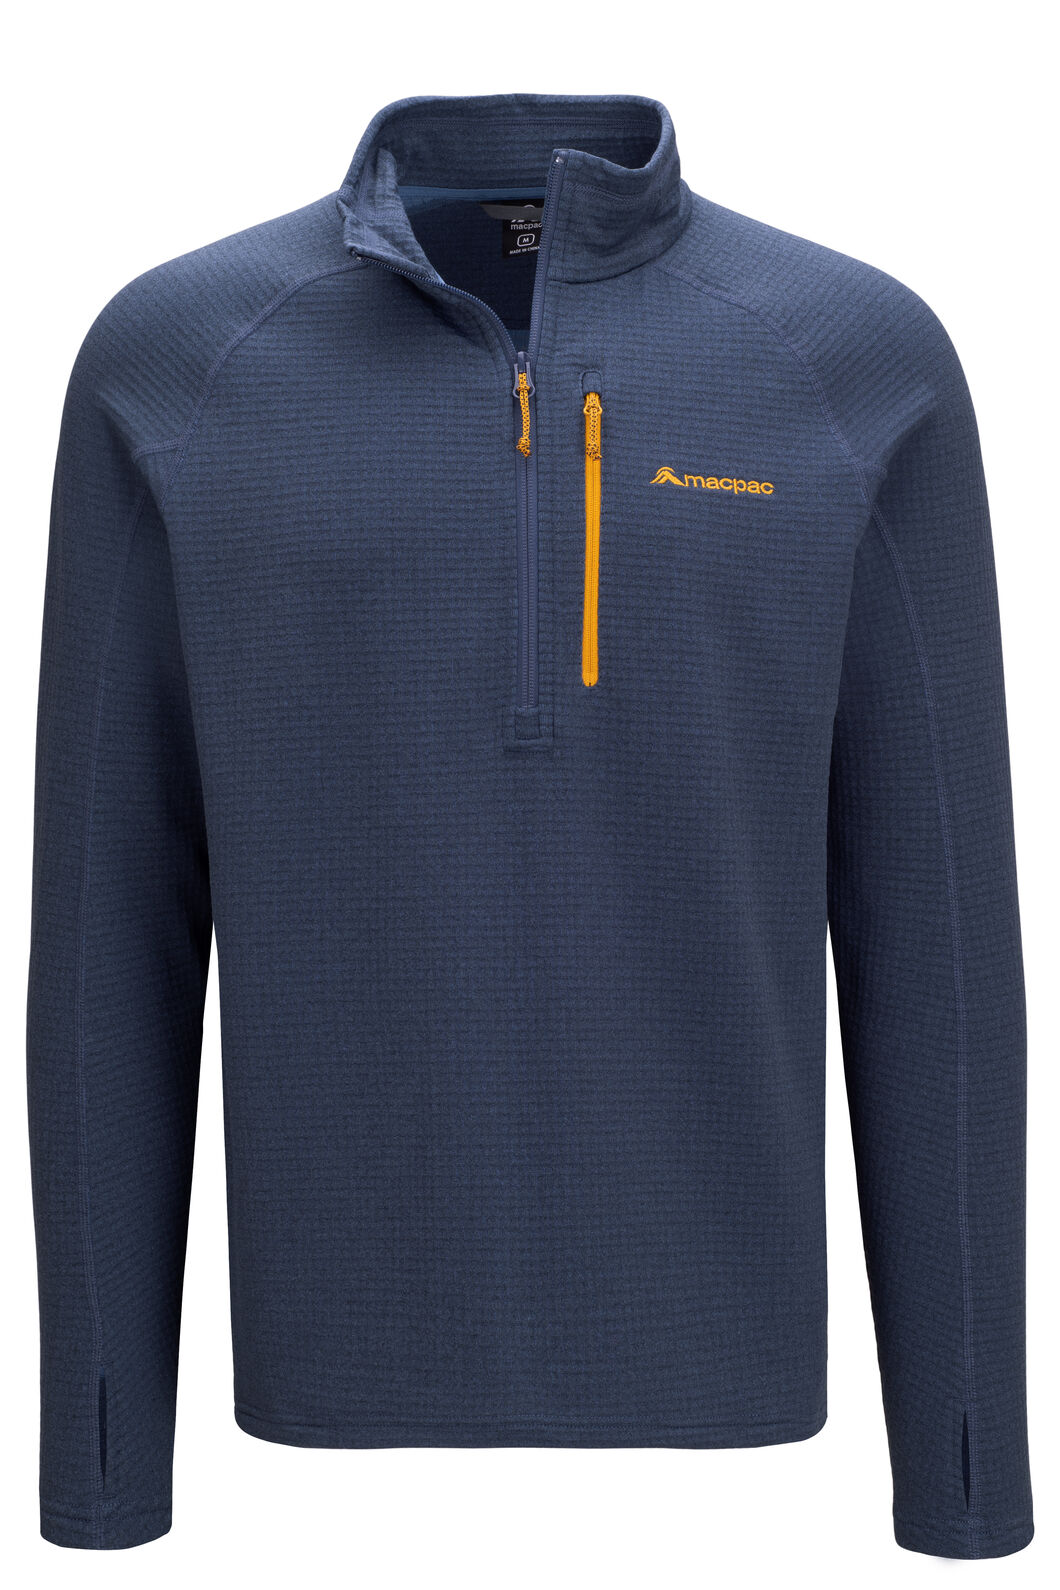 Macpac Ion Polartec® Fleece Half Zip Pullover — Men's, Ensign Blue, hi-res